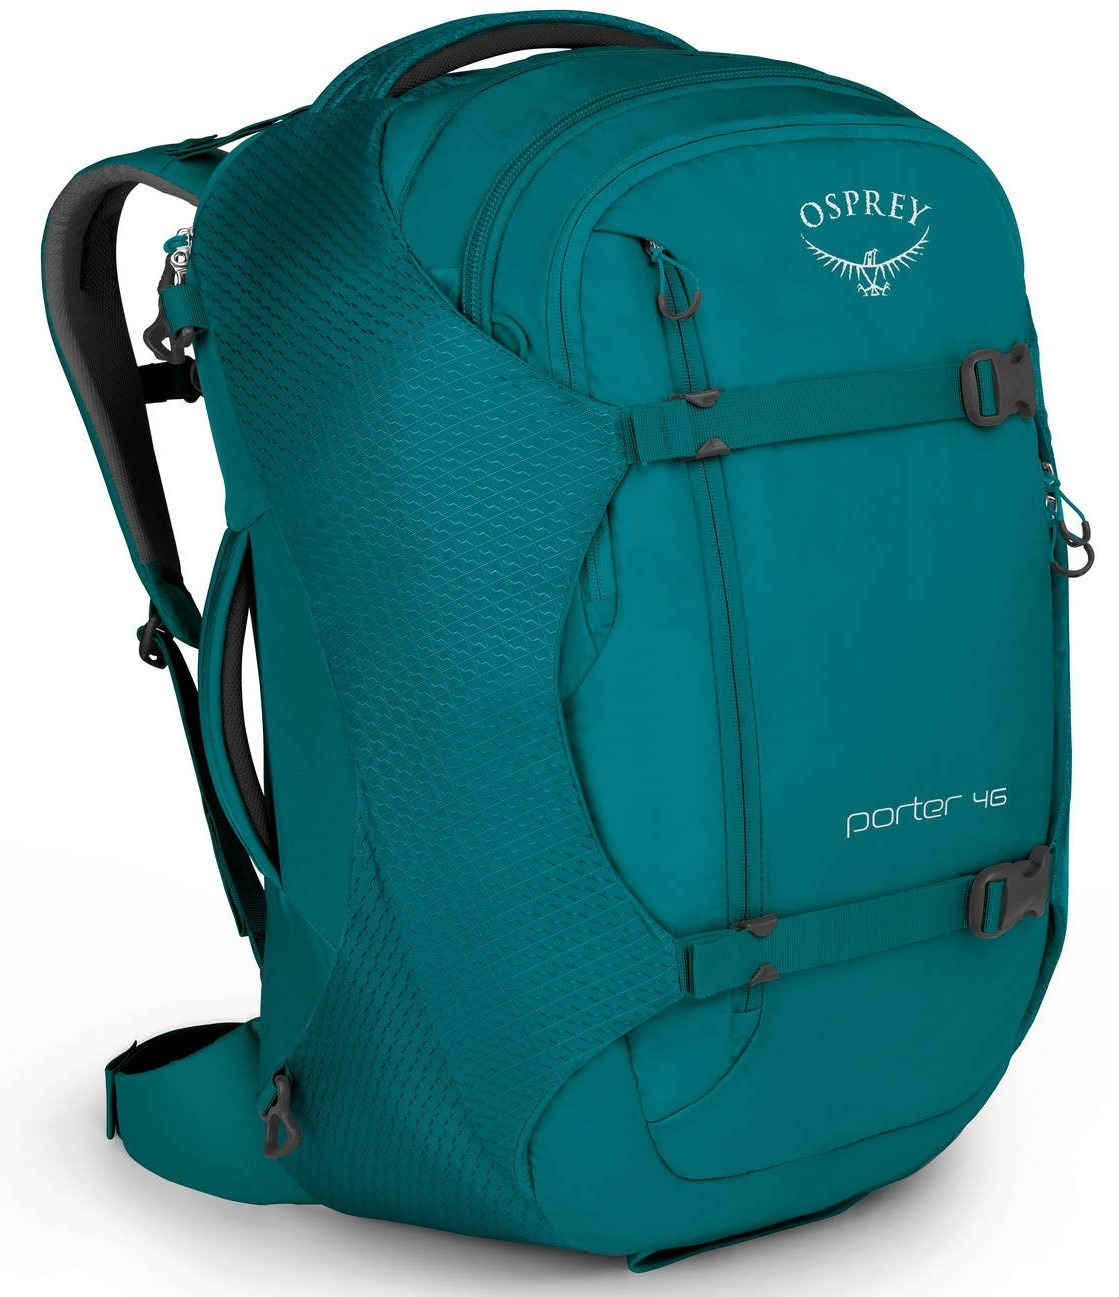 Сумки-рюкзаки Сумка-рюкзак Osprey Porter 46 Mineral Teal Porter_46_F17_Side_Mineral_Teal_web.jpg